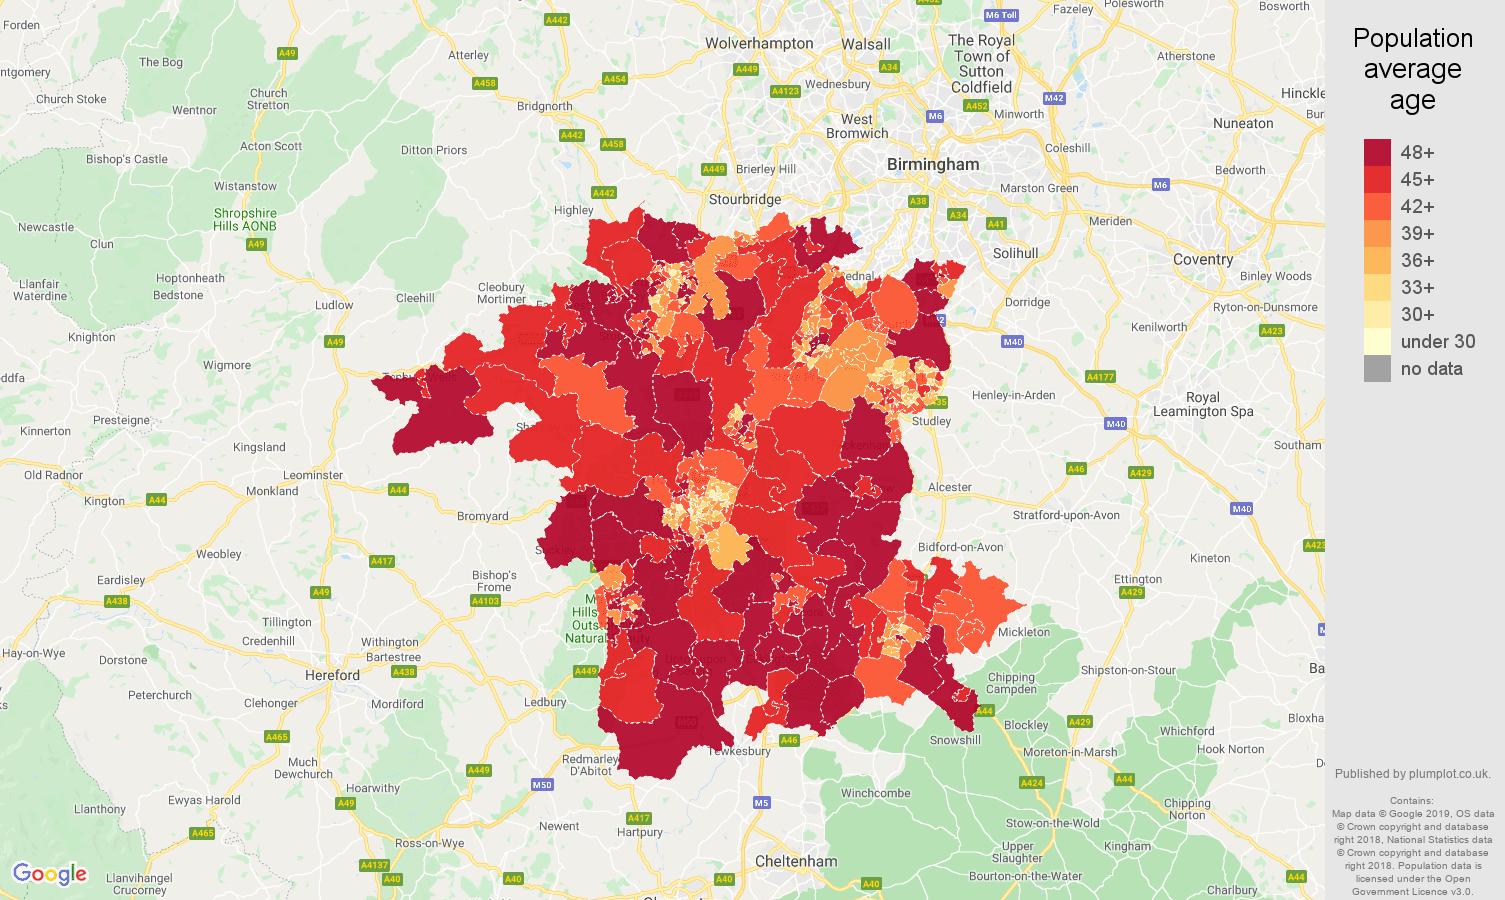 Worcestershire population average age map